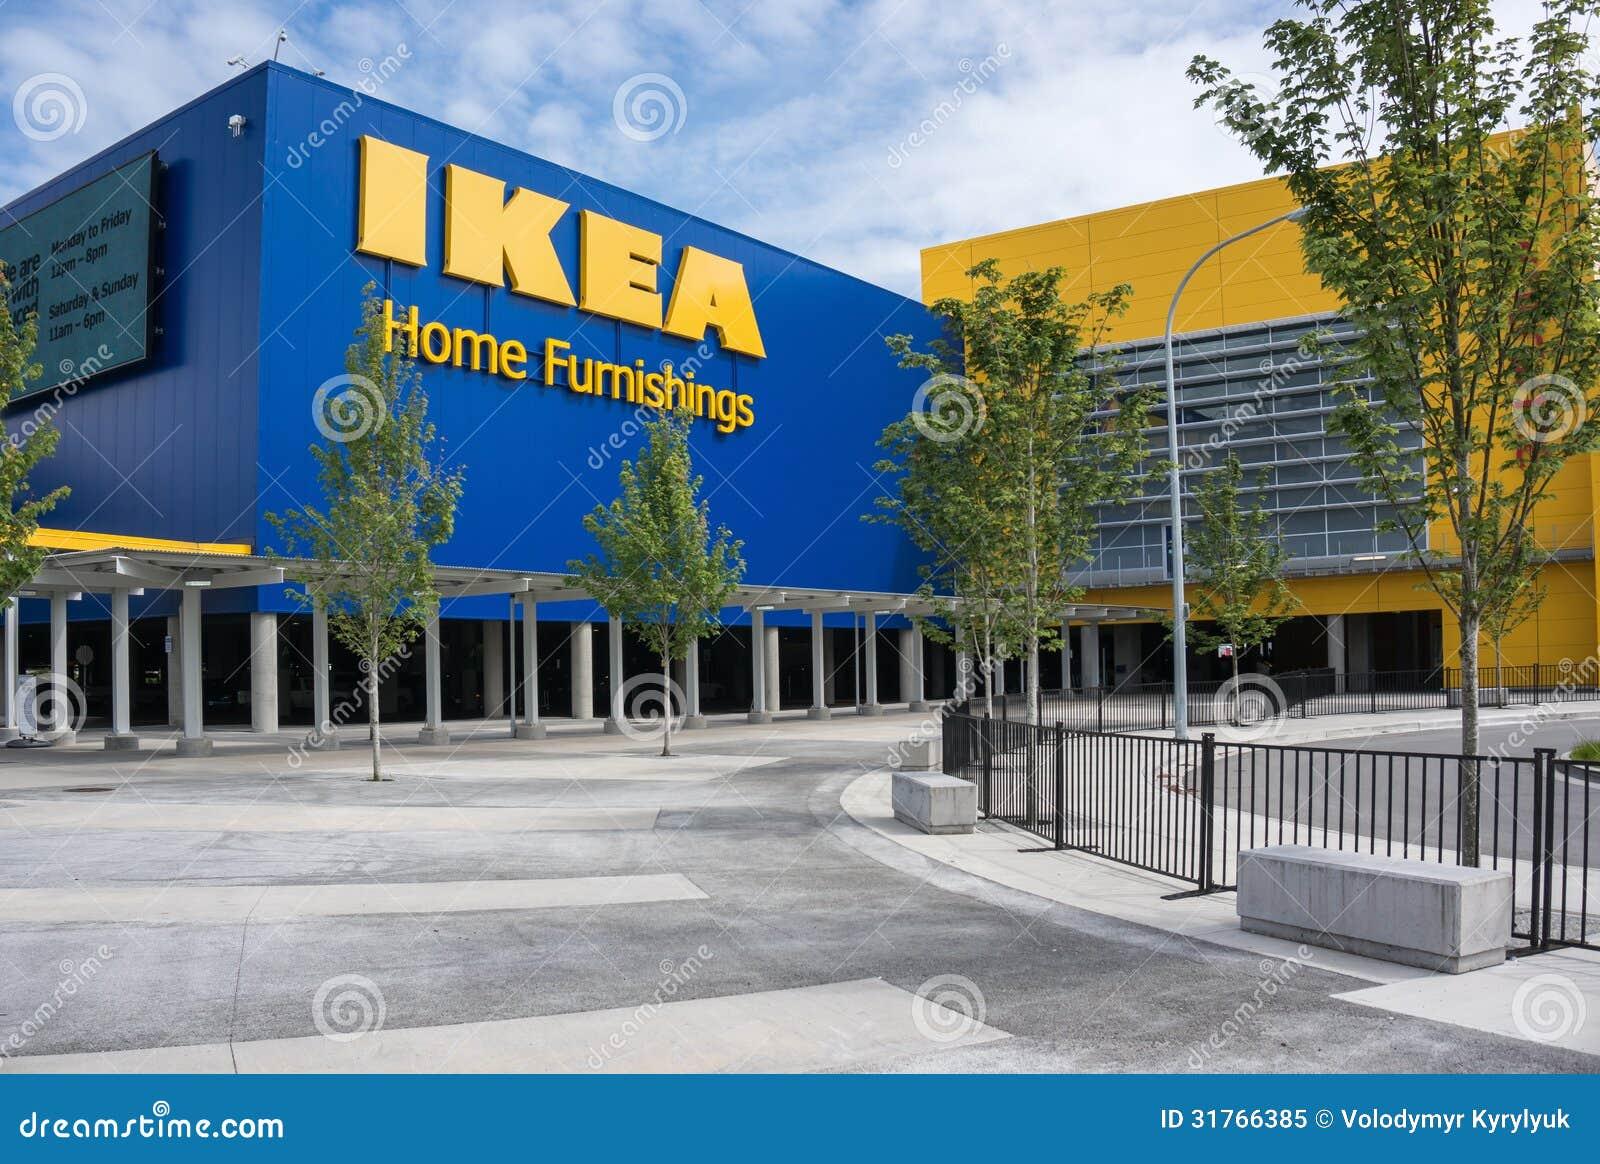 Ikea Editorial Image Image 31766385